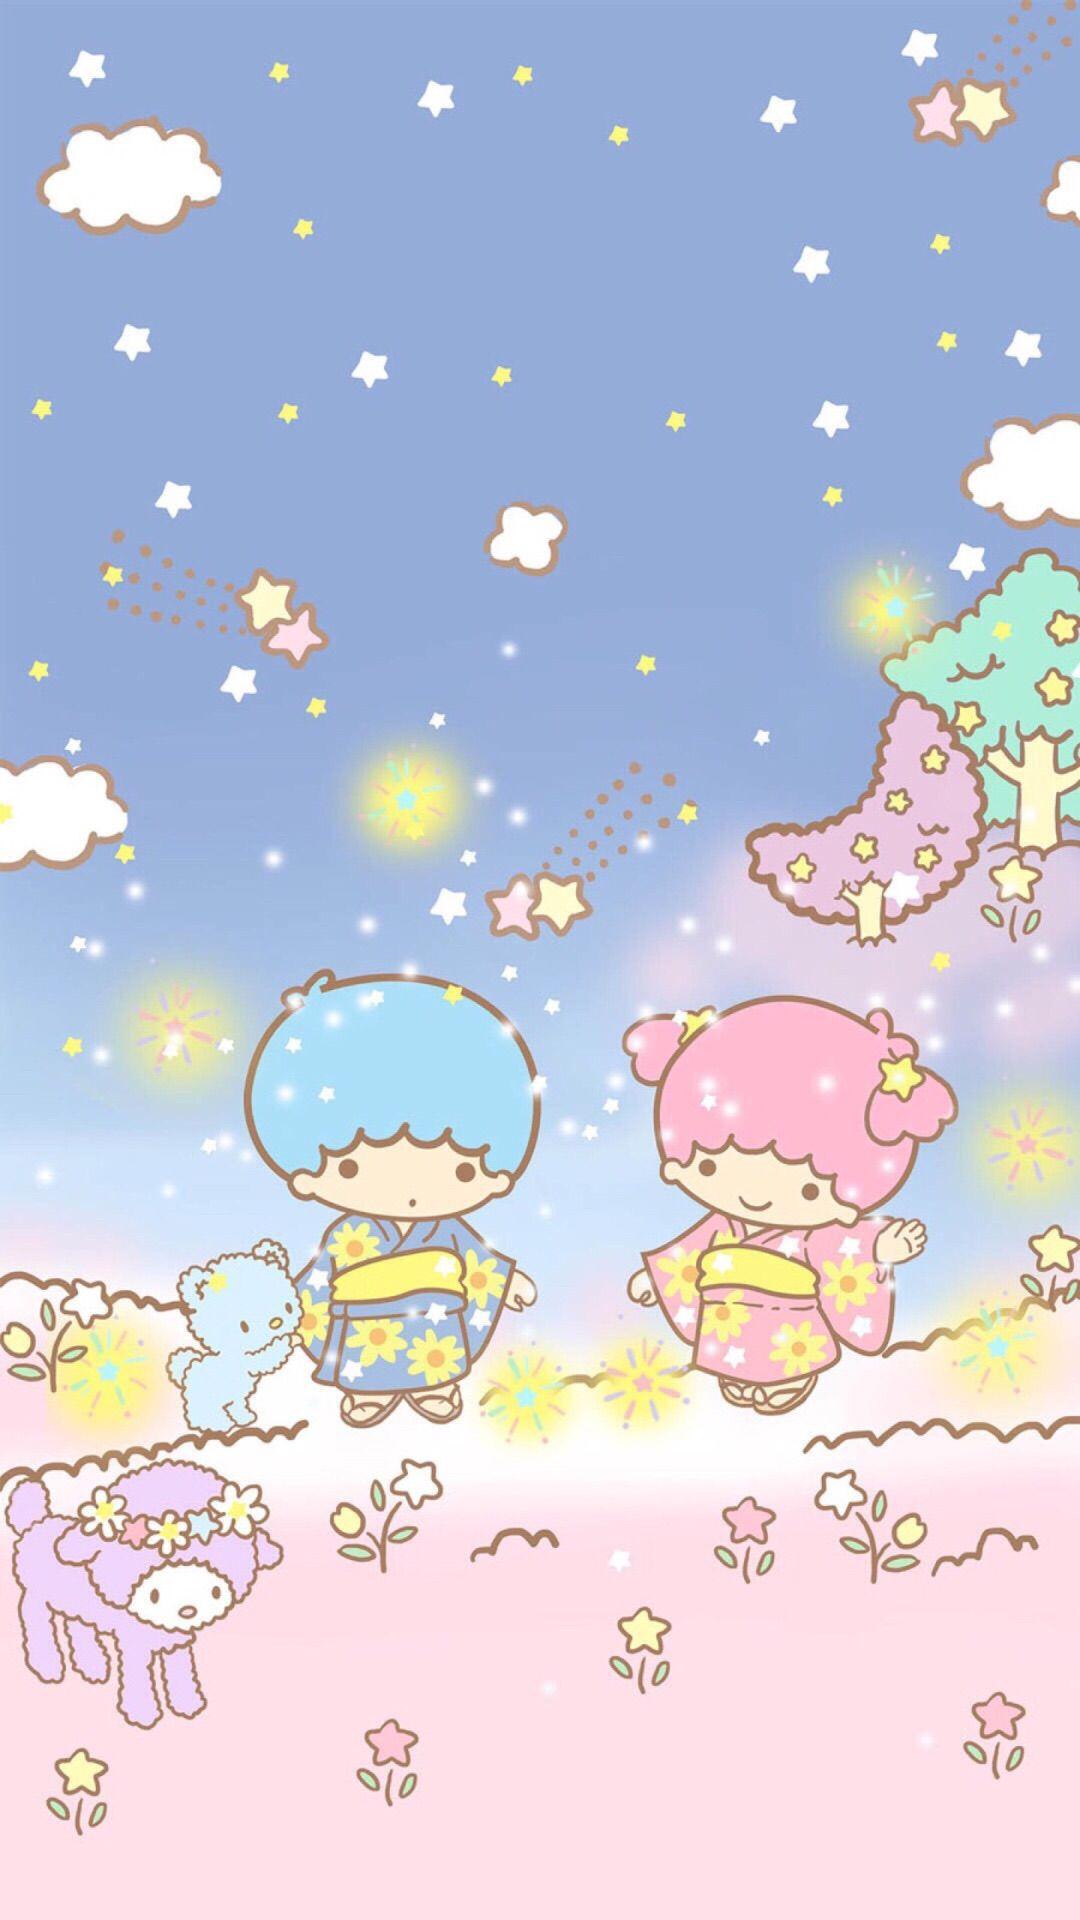 Wonderful Wallpaper Hello Kitty Sakura - fd20625bae03395e59da6a336291f026  Trends_152118.jpg